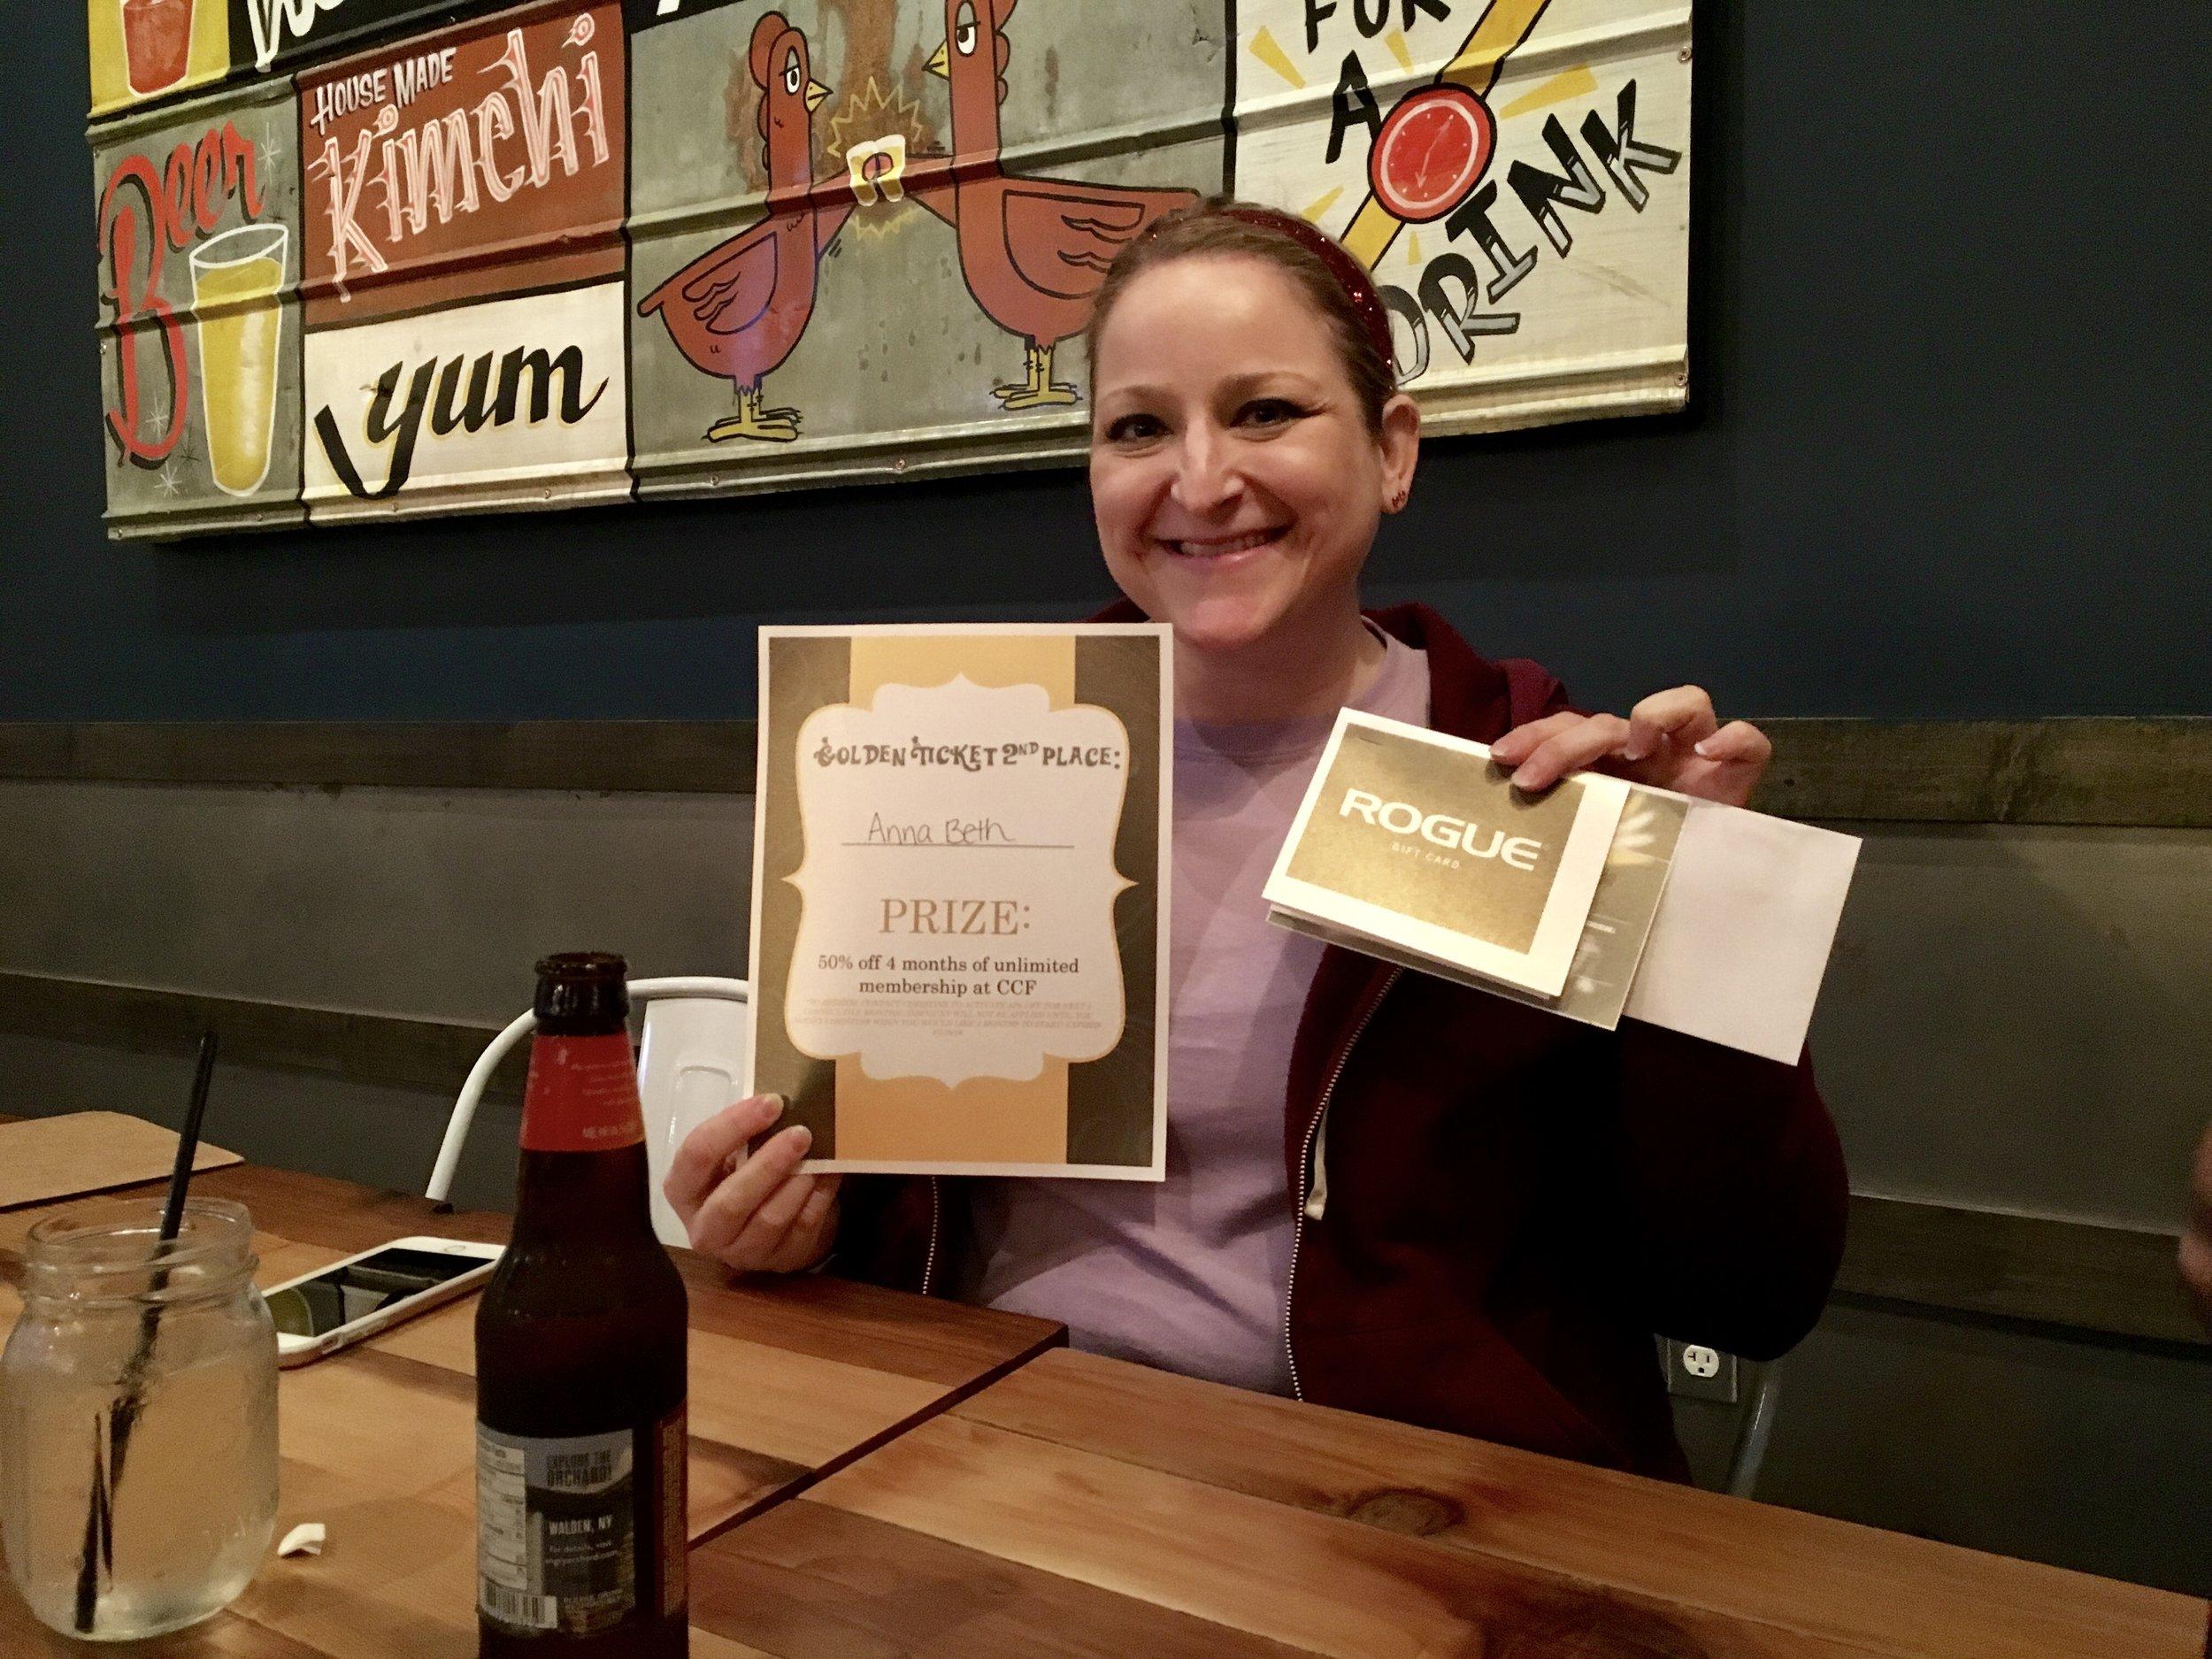 All the Prizes! Go Anna Beth!